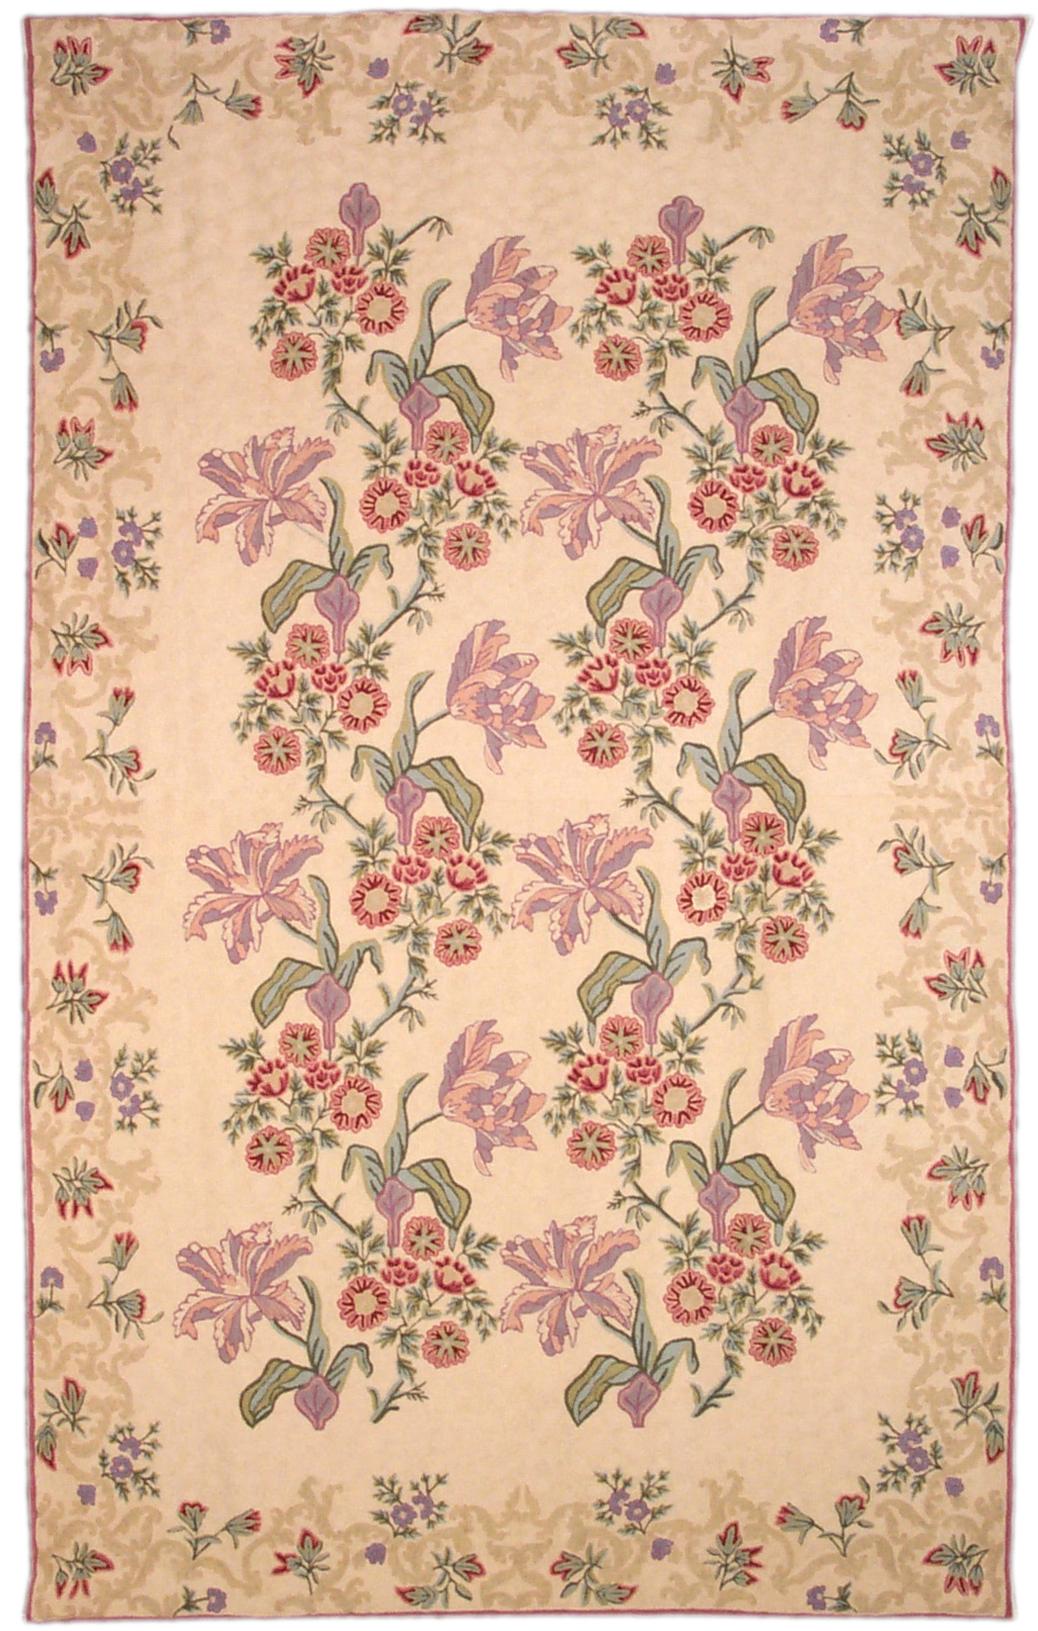 lily blush{PD-99-25 BLUSH}5x8